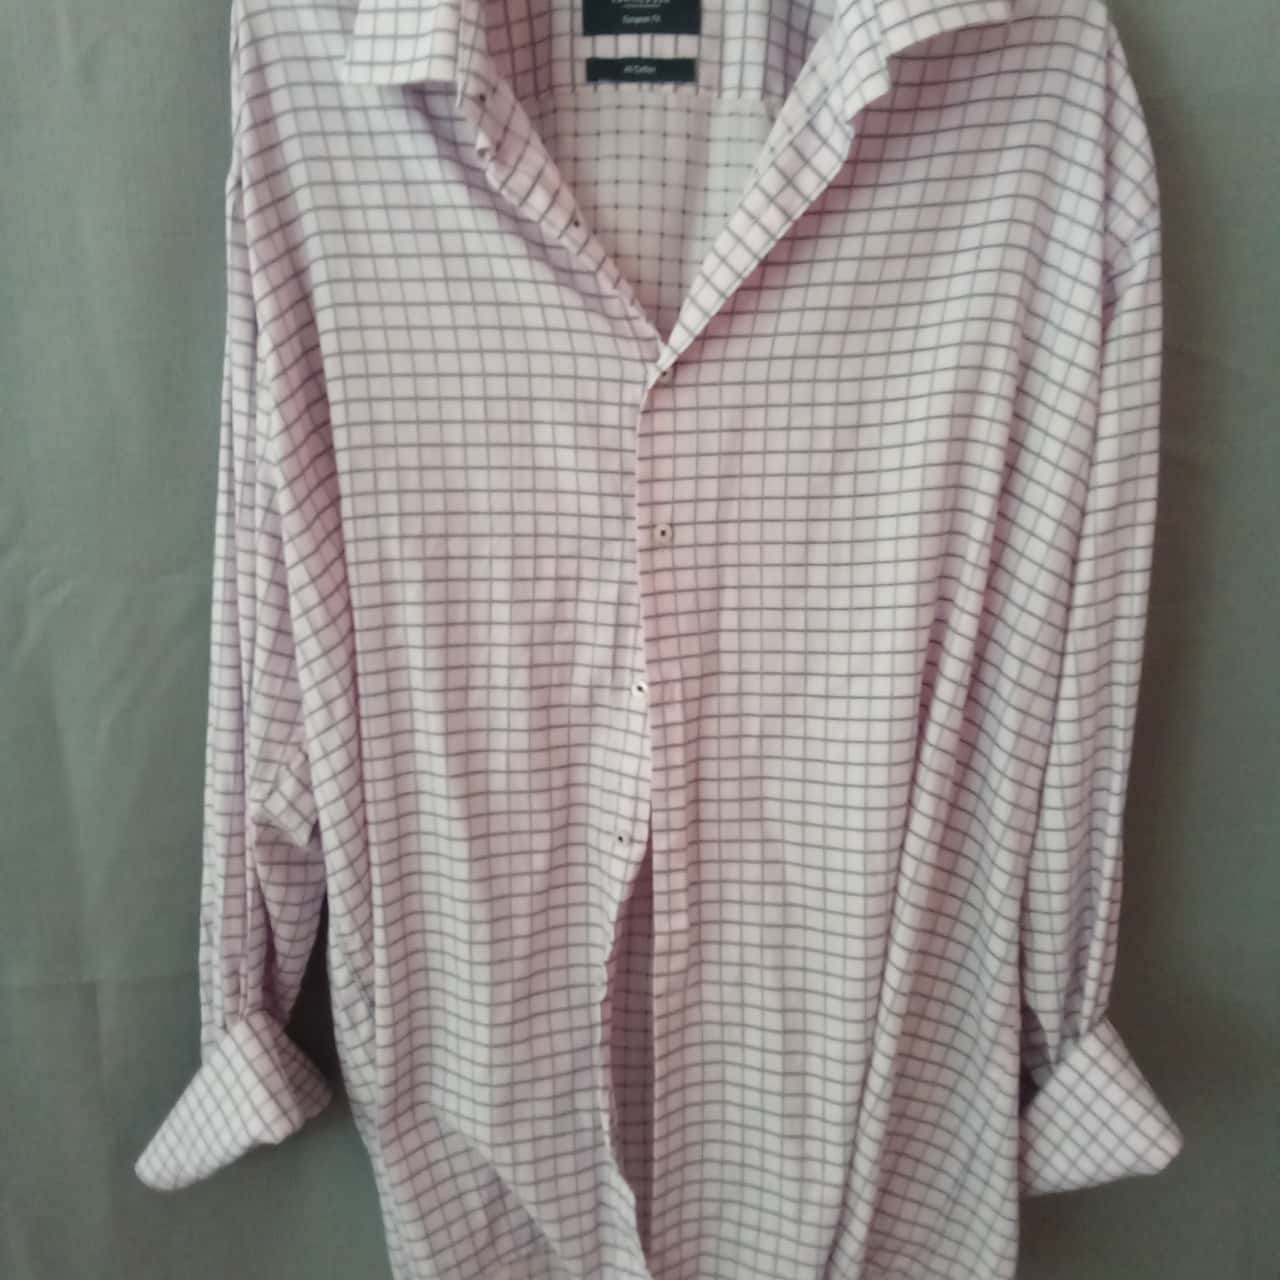 REDUCED WAS $12 NOW $5 Van Heusen Mens Pink/Blue Grid Shirt Size 46 UAN